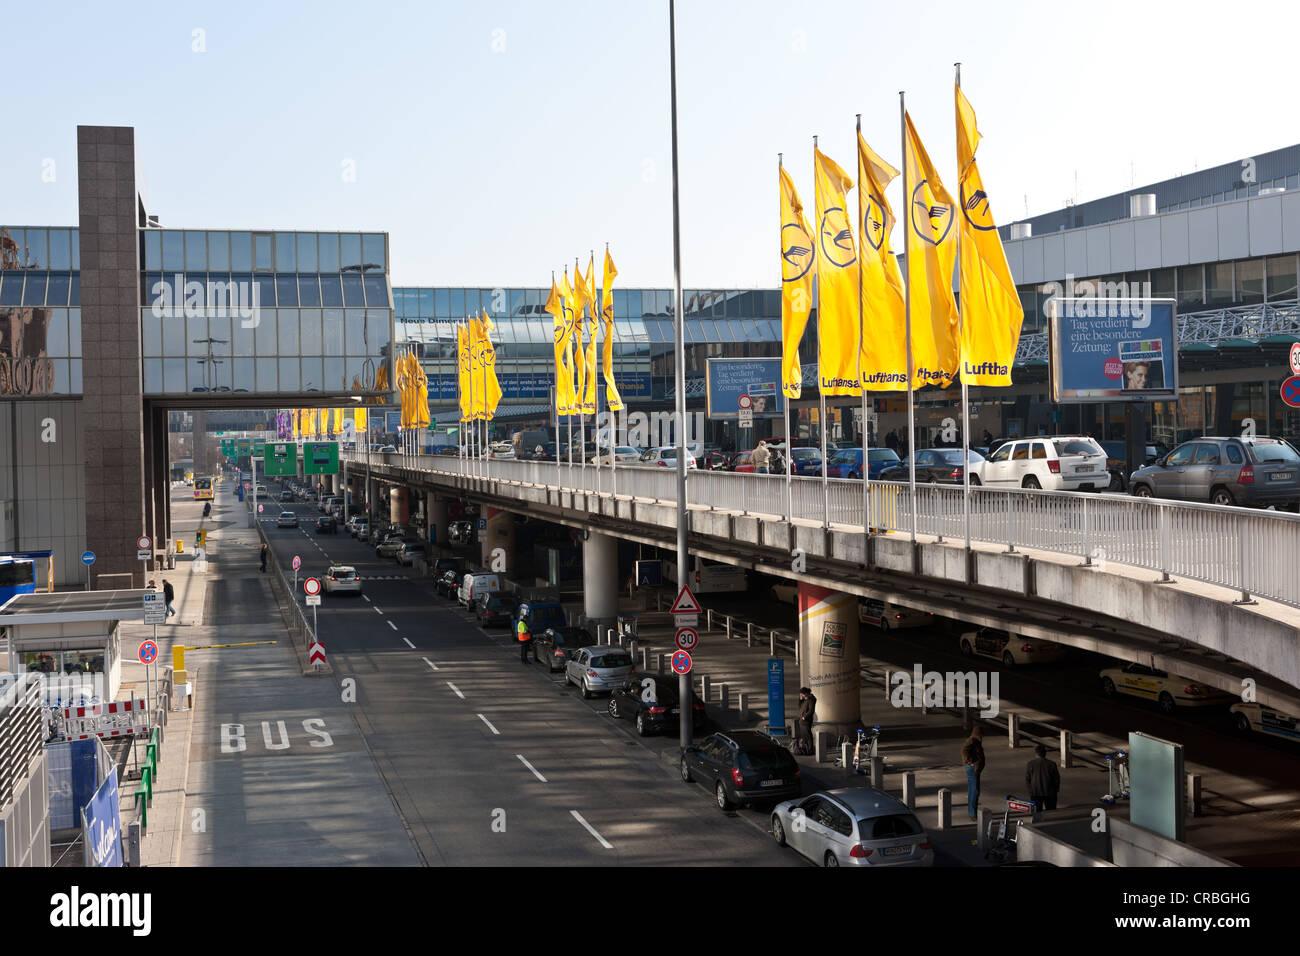 Frankfurt Flughafen, Ankunft Terminal 1, Frankfurt Am Main, Hessen, Deutschland, Europa Stockbild